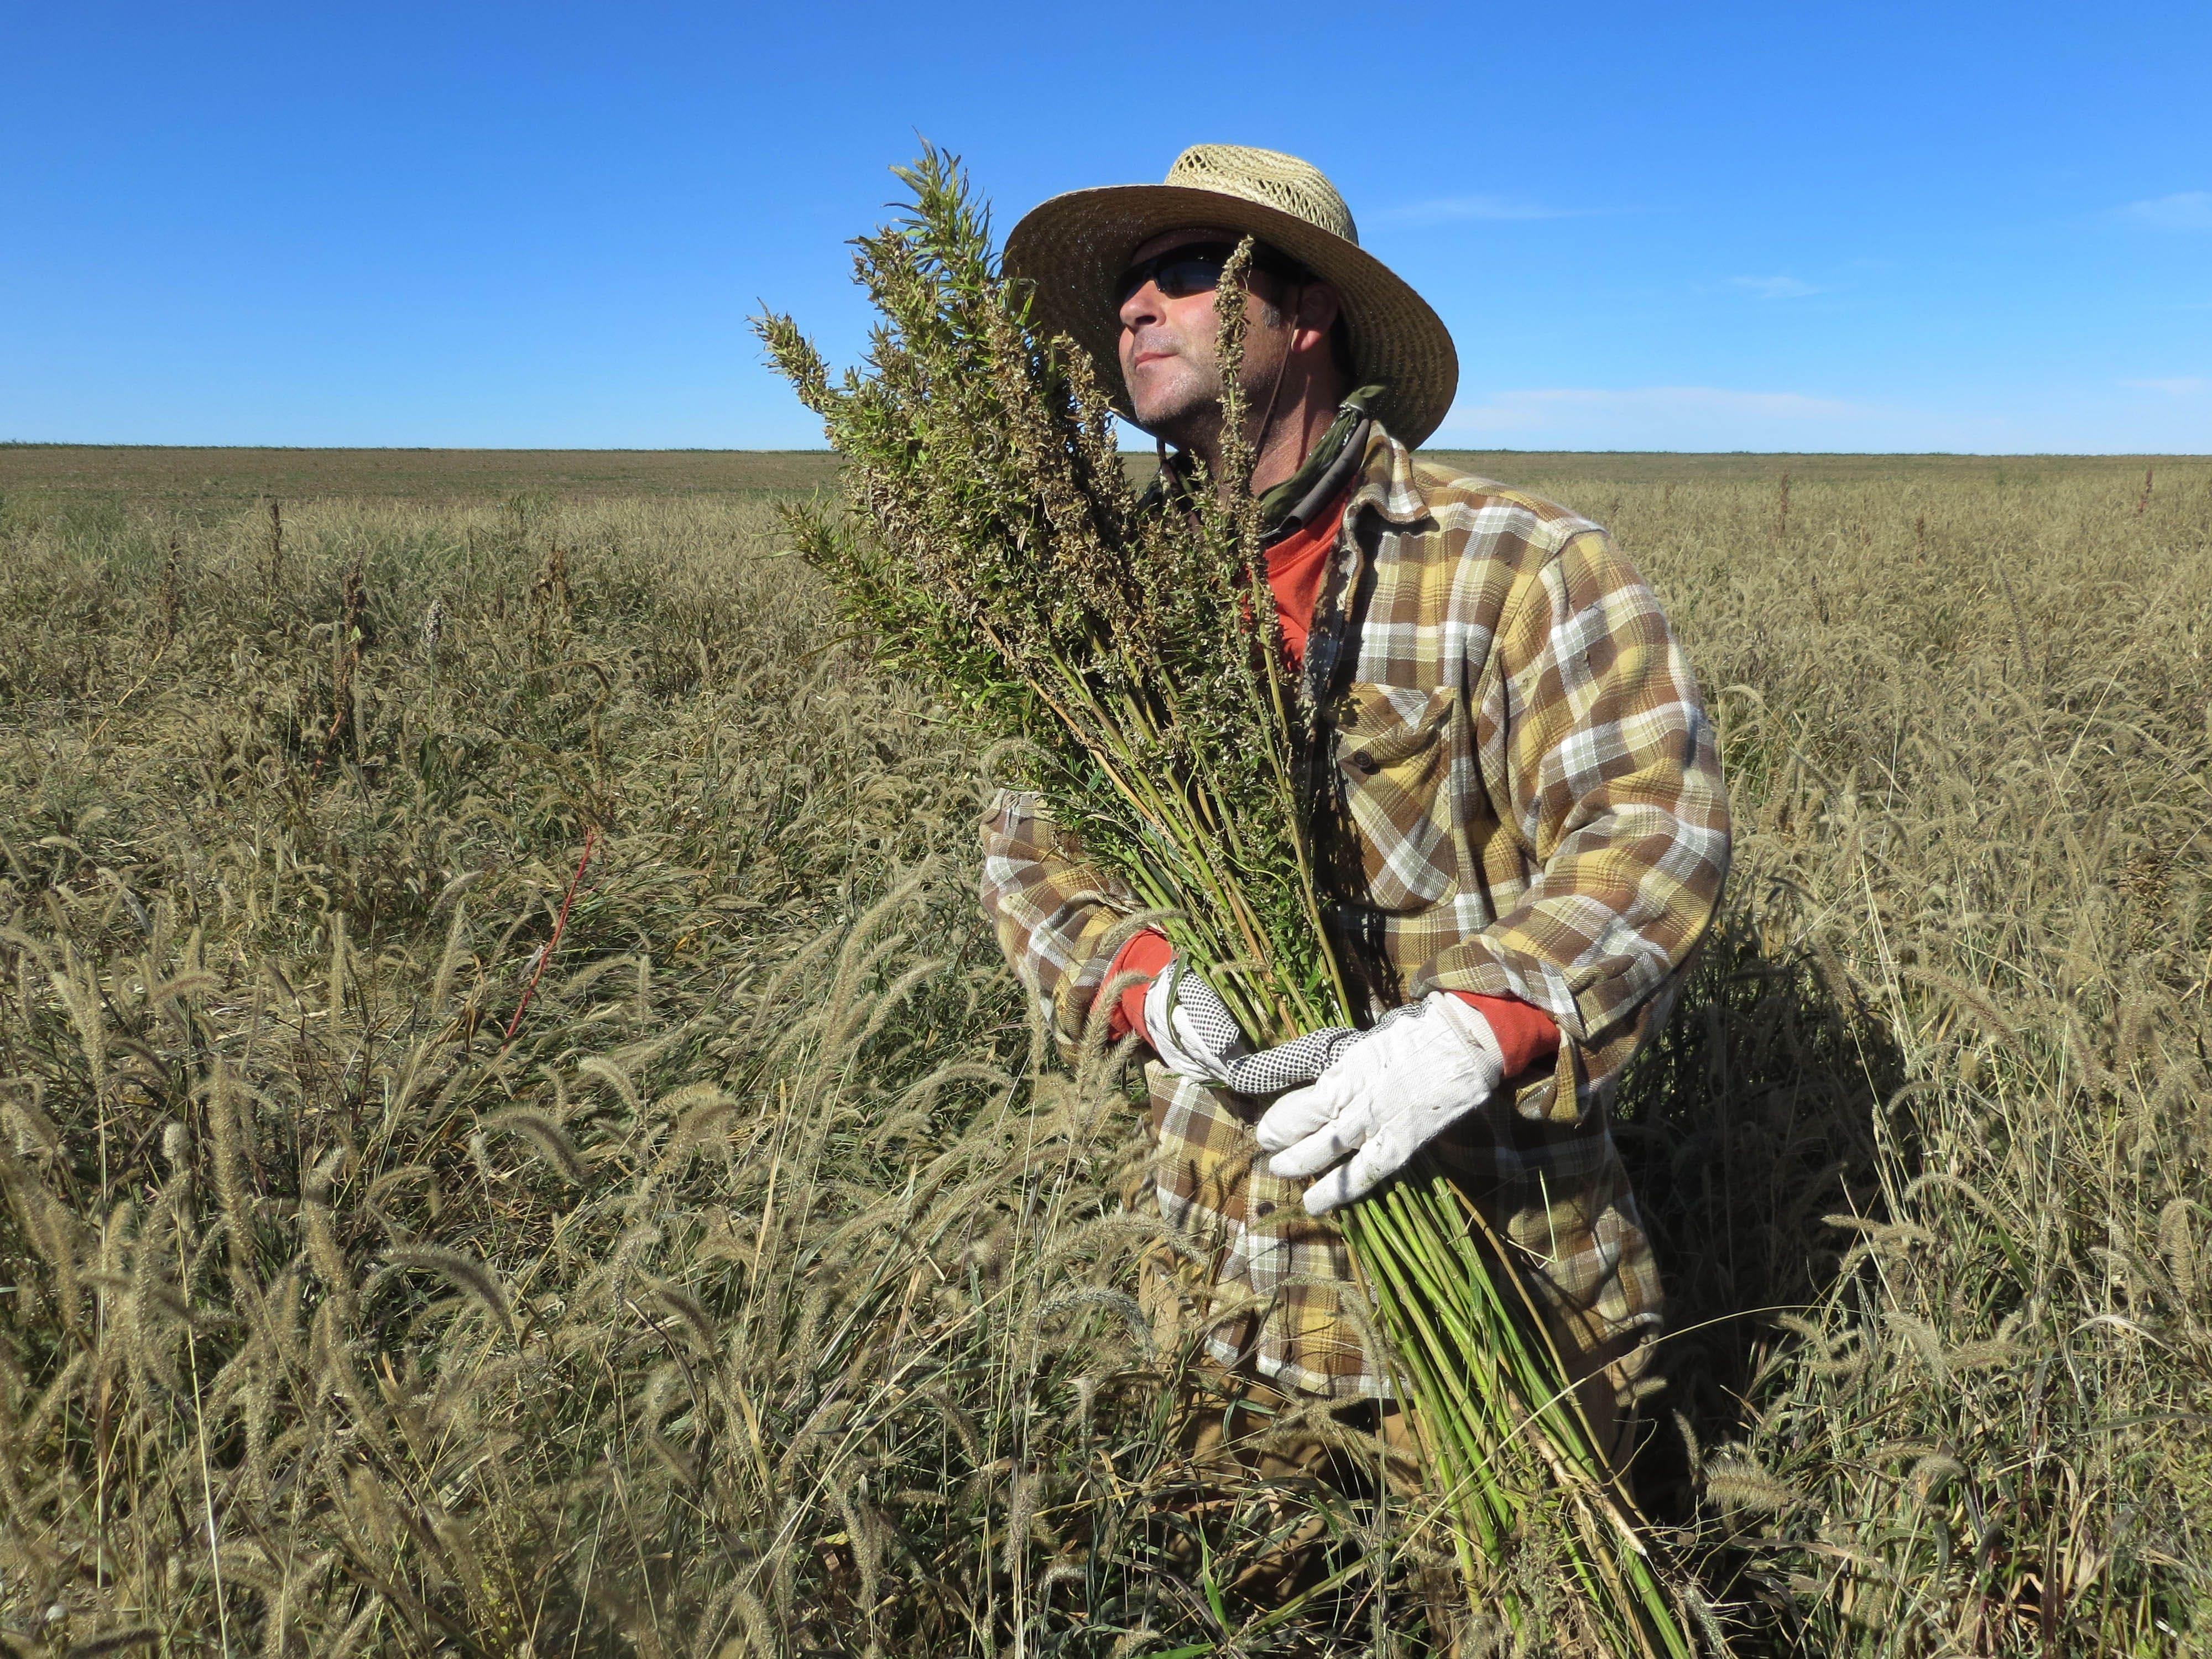 Farmers Harvesting Crops Colorado Farmers Harvesting